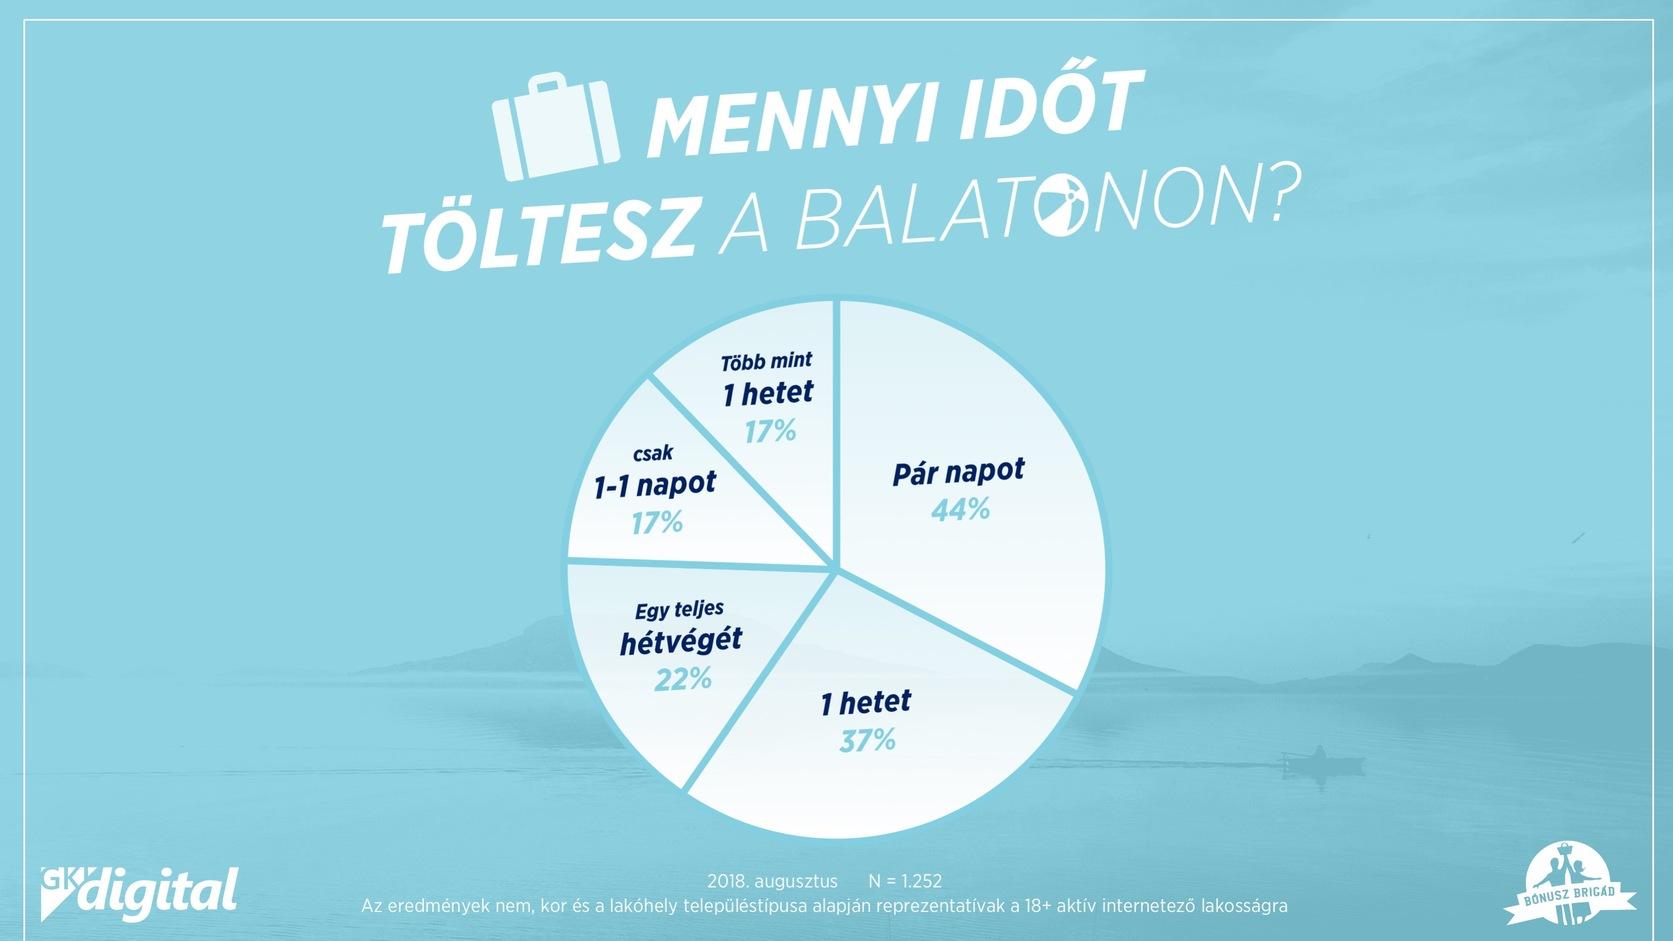 BB-GKID_Balaton_0005